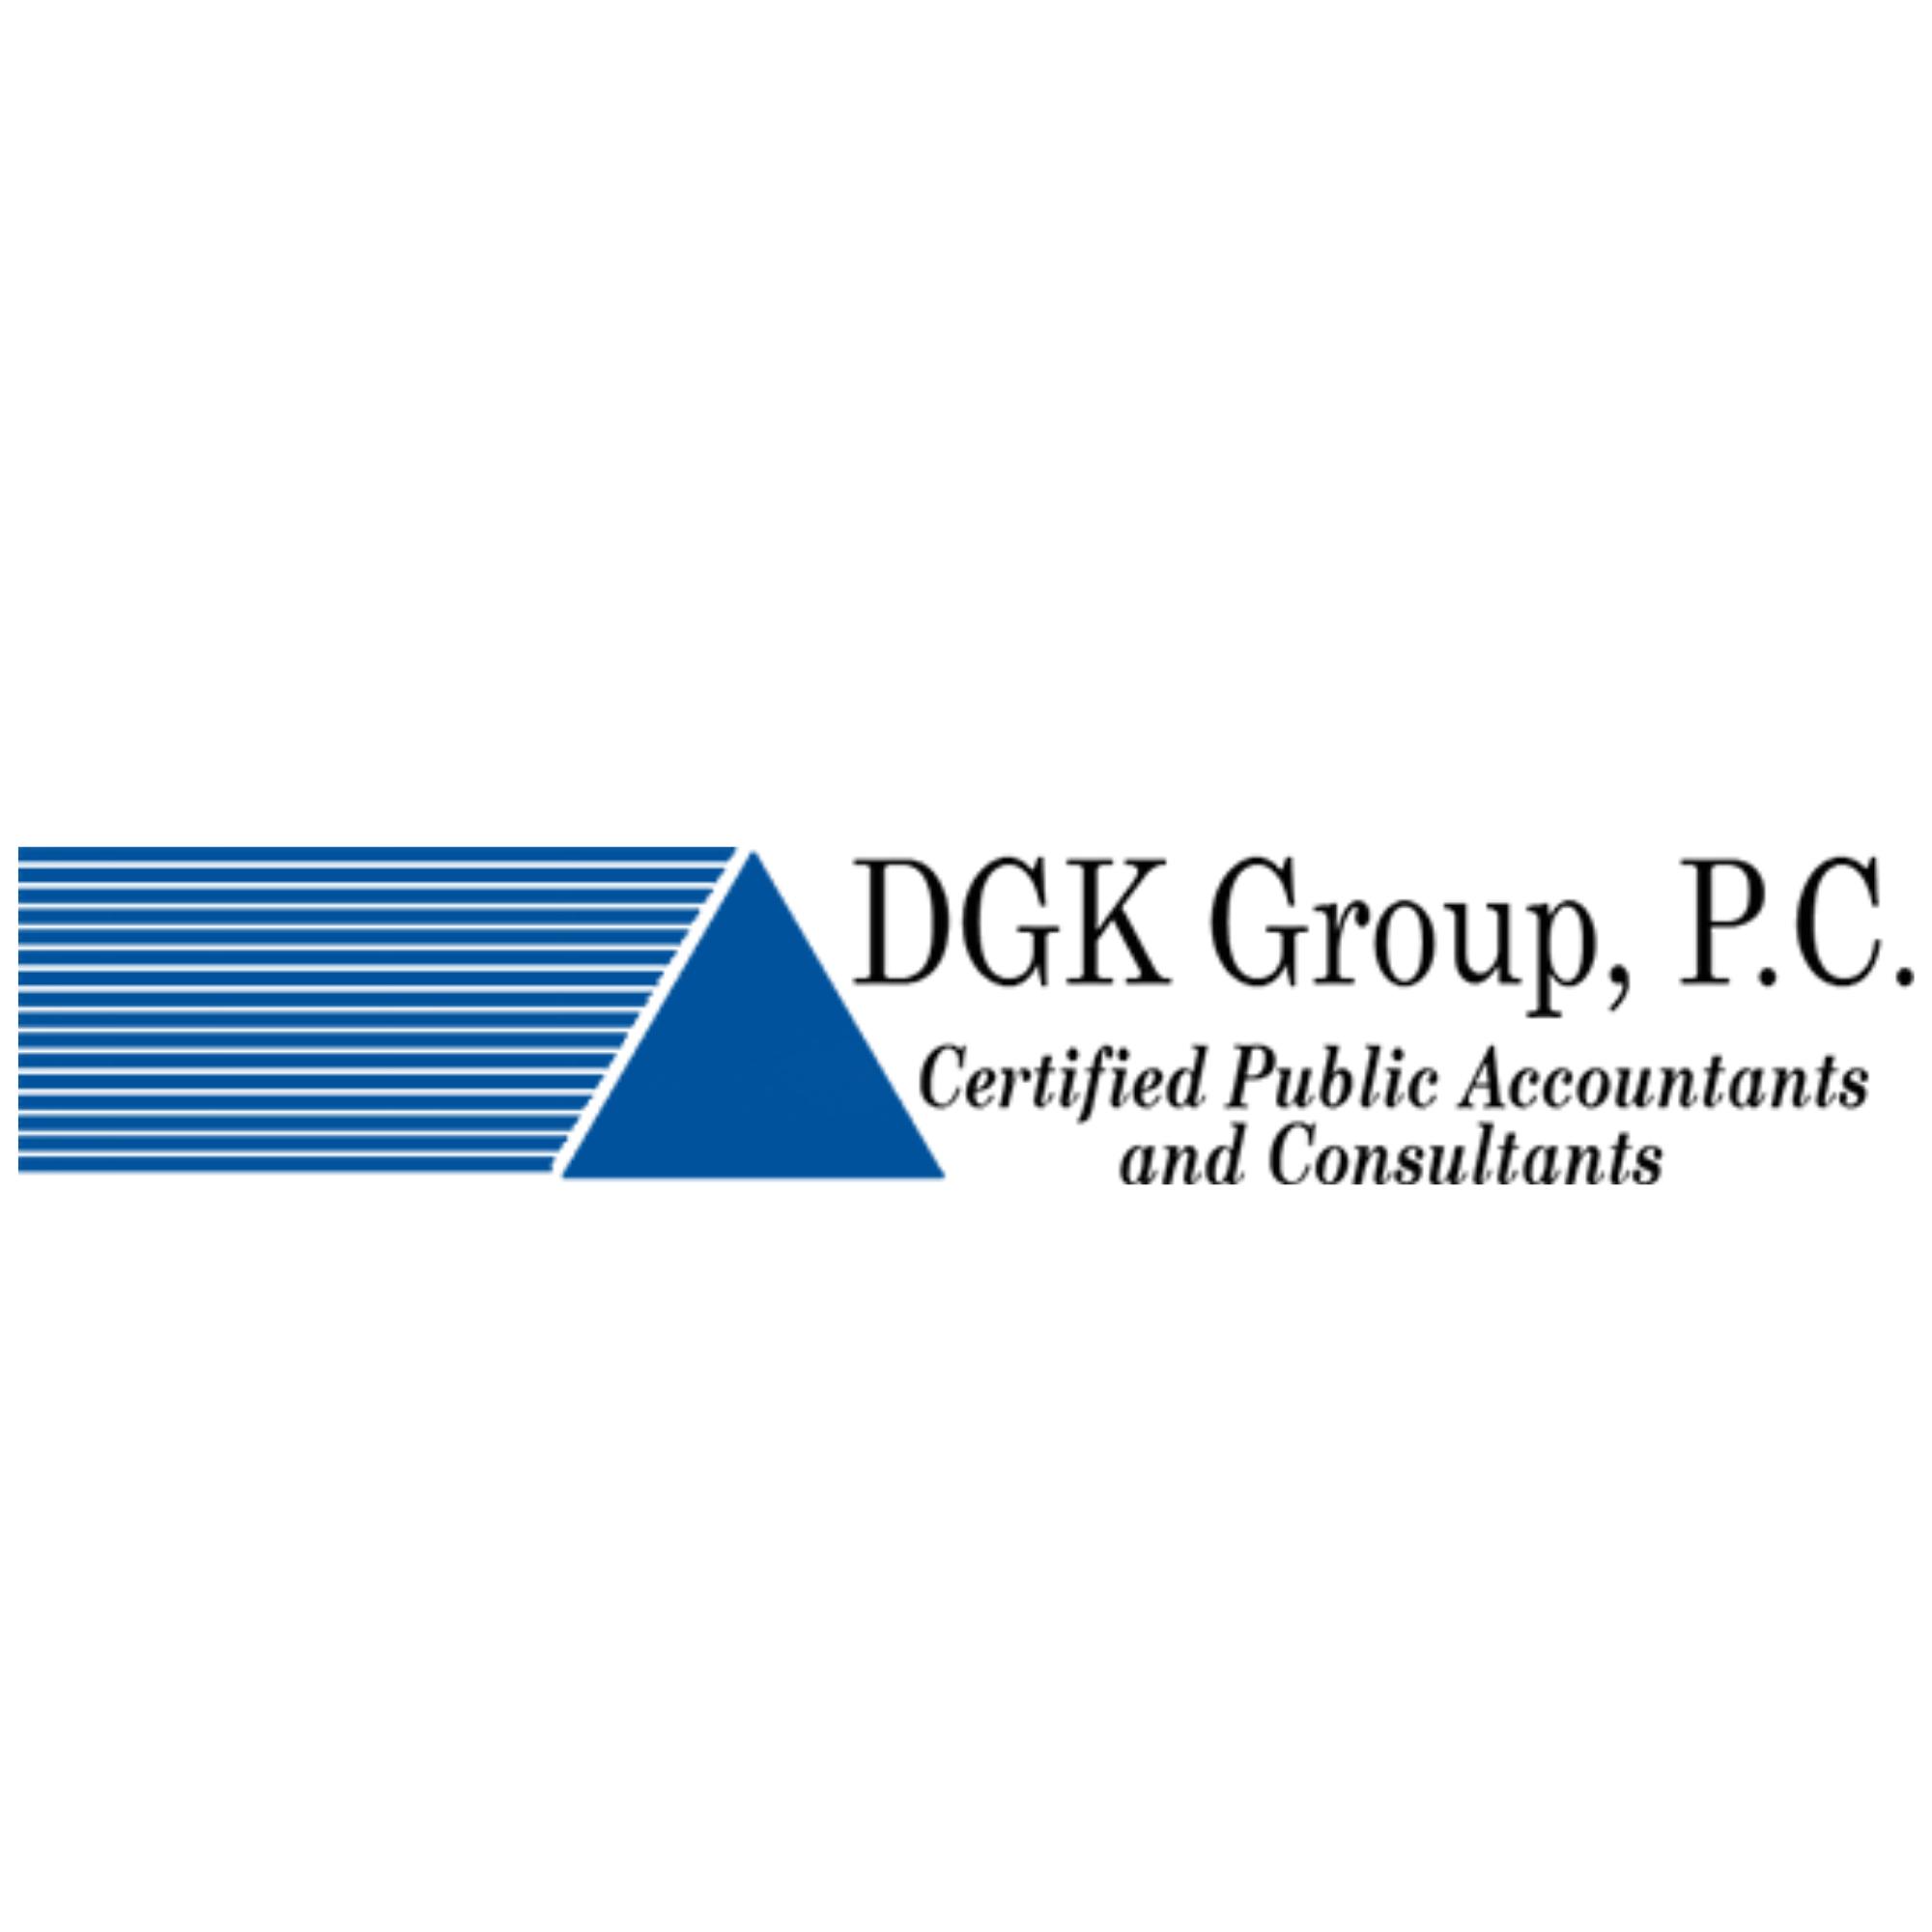 DGK Group